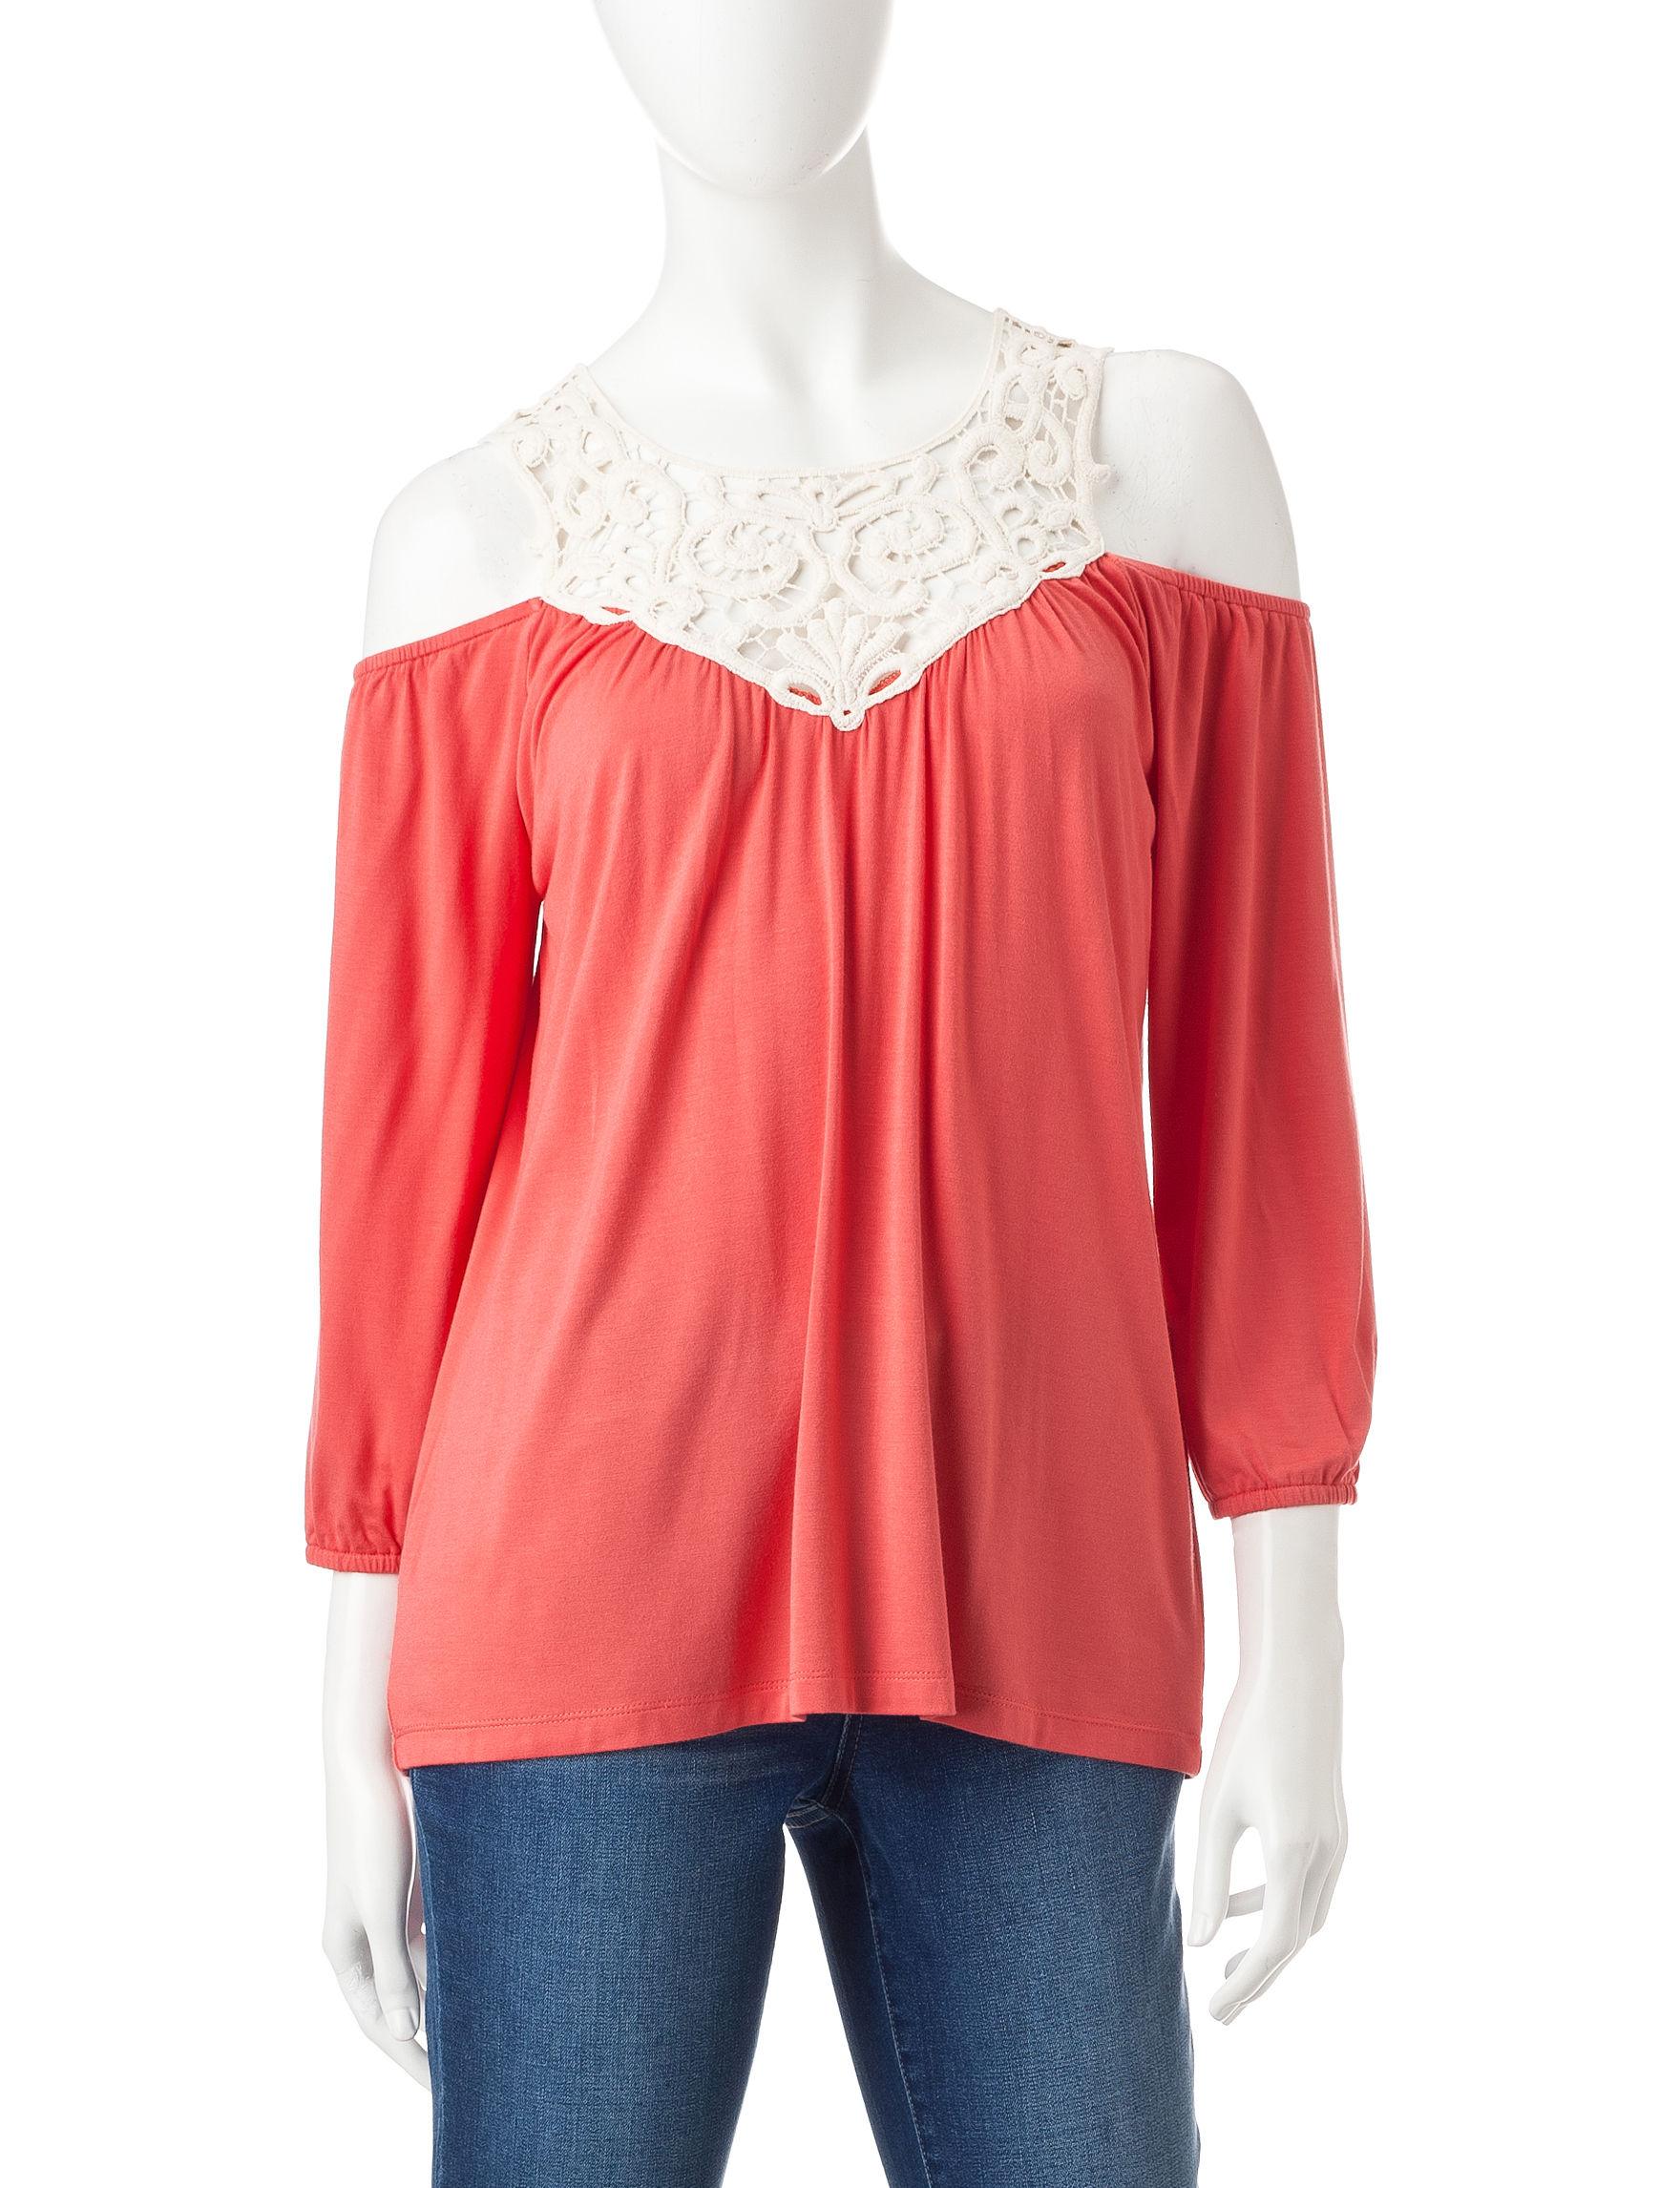 Signature Studio Pink Shirts & Blouses